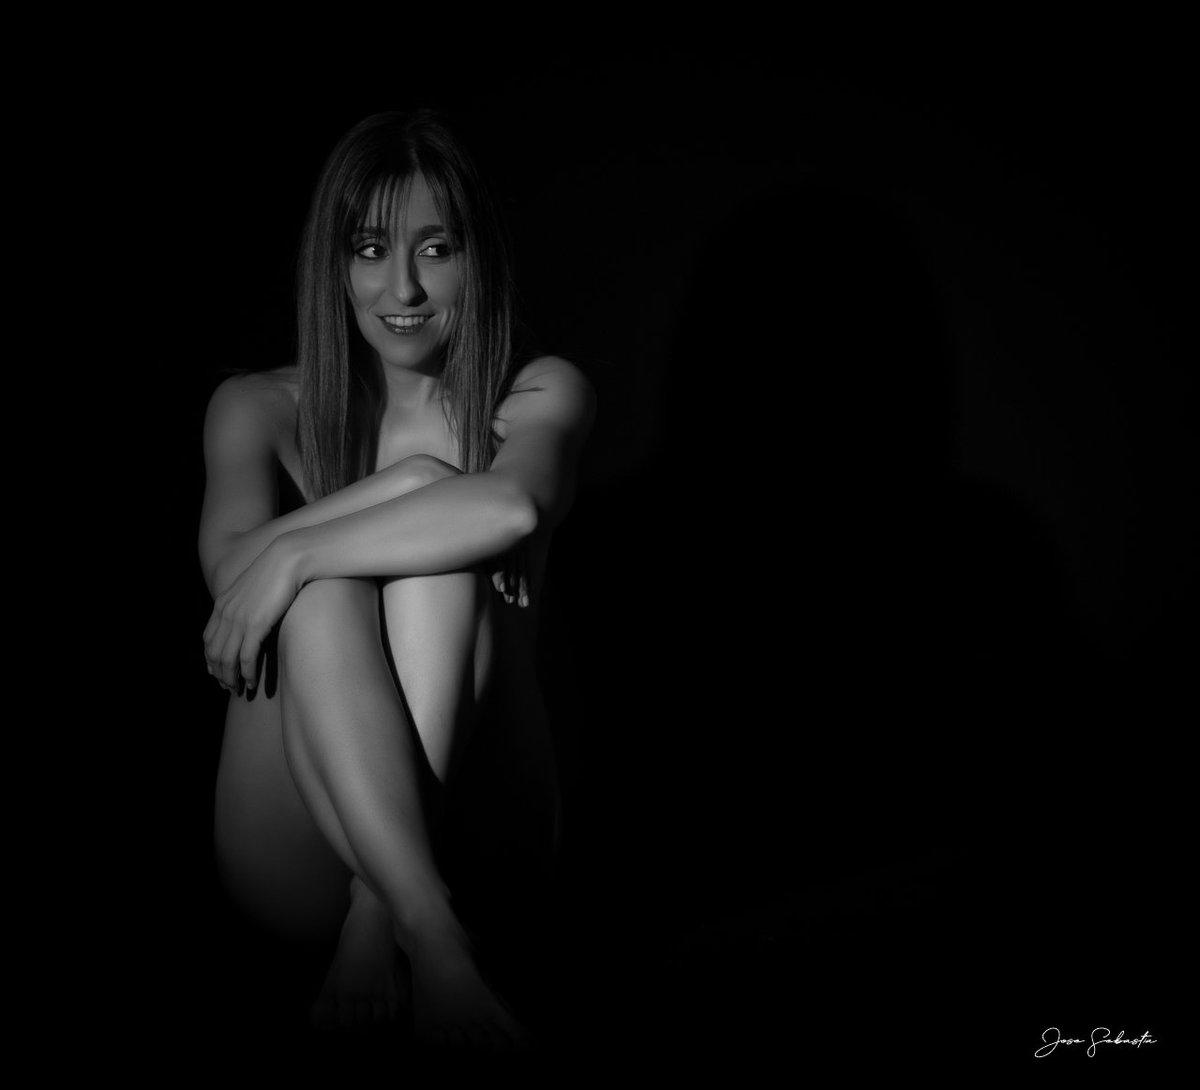 #Beauty #Model #Modelo #Retrato #Portrait #CanonFeed #FotografiaDeRetrato #Photographer #Fotografo #Photography #Fotografia #FotografoValencia #FotografiaValencia #NudeArtistic #NudeArt #ArtNude #NudeShoot #NudeArtPhotography #DesnudoArtistico #PhotoArt #ArtPhotographypic.twitter.com/CQQDfgw4rt